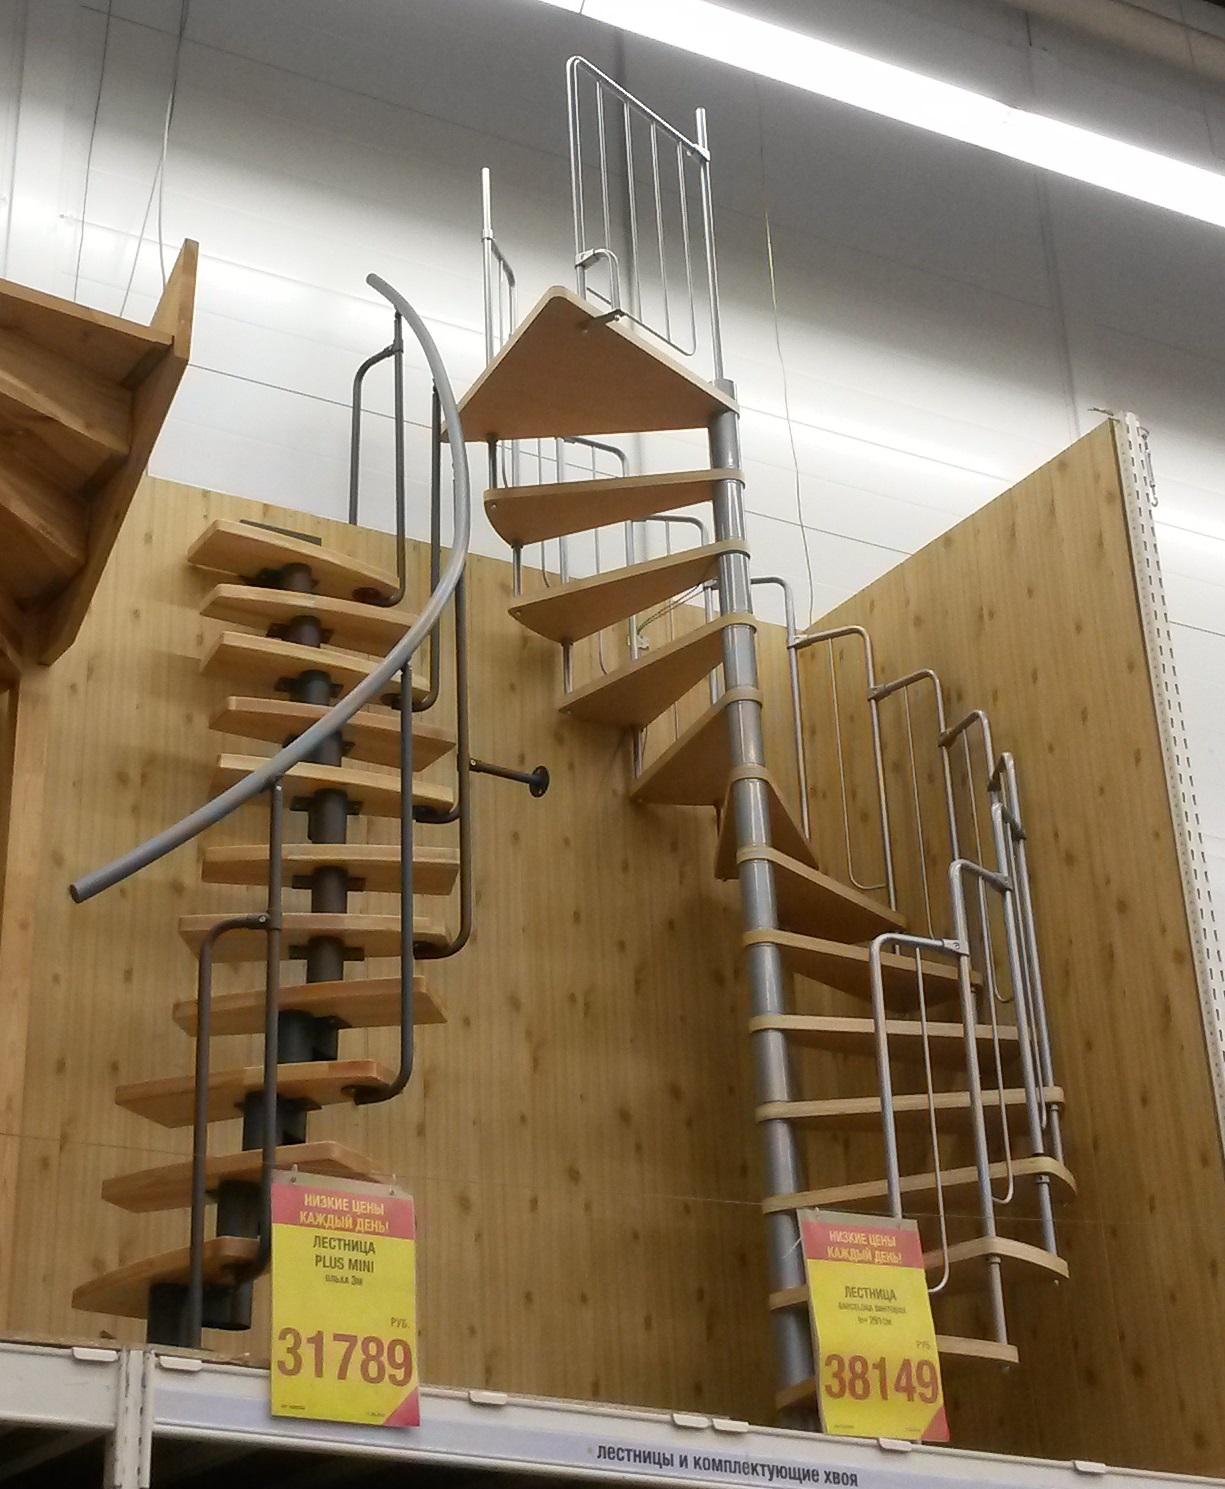 tles - Элементы лестниц